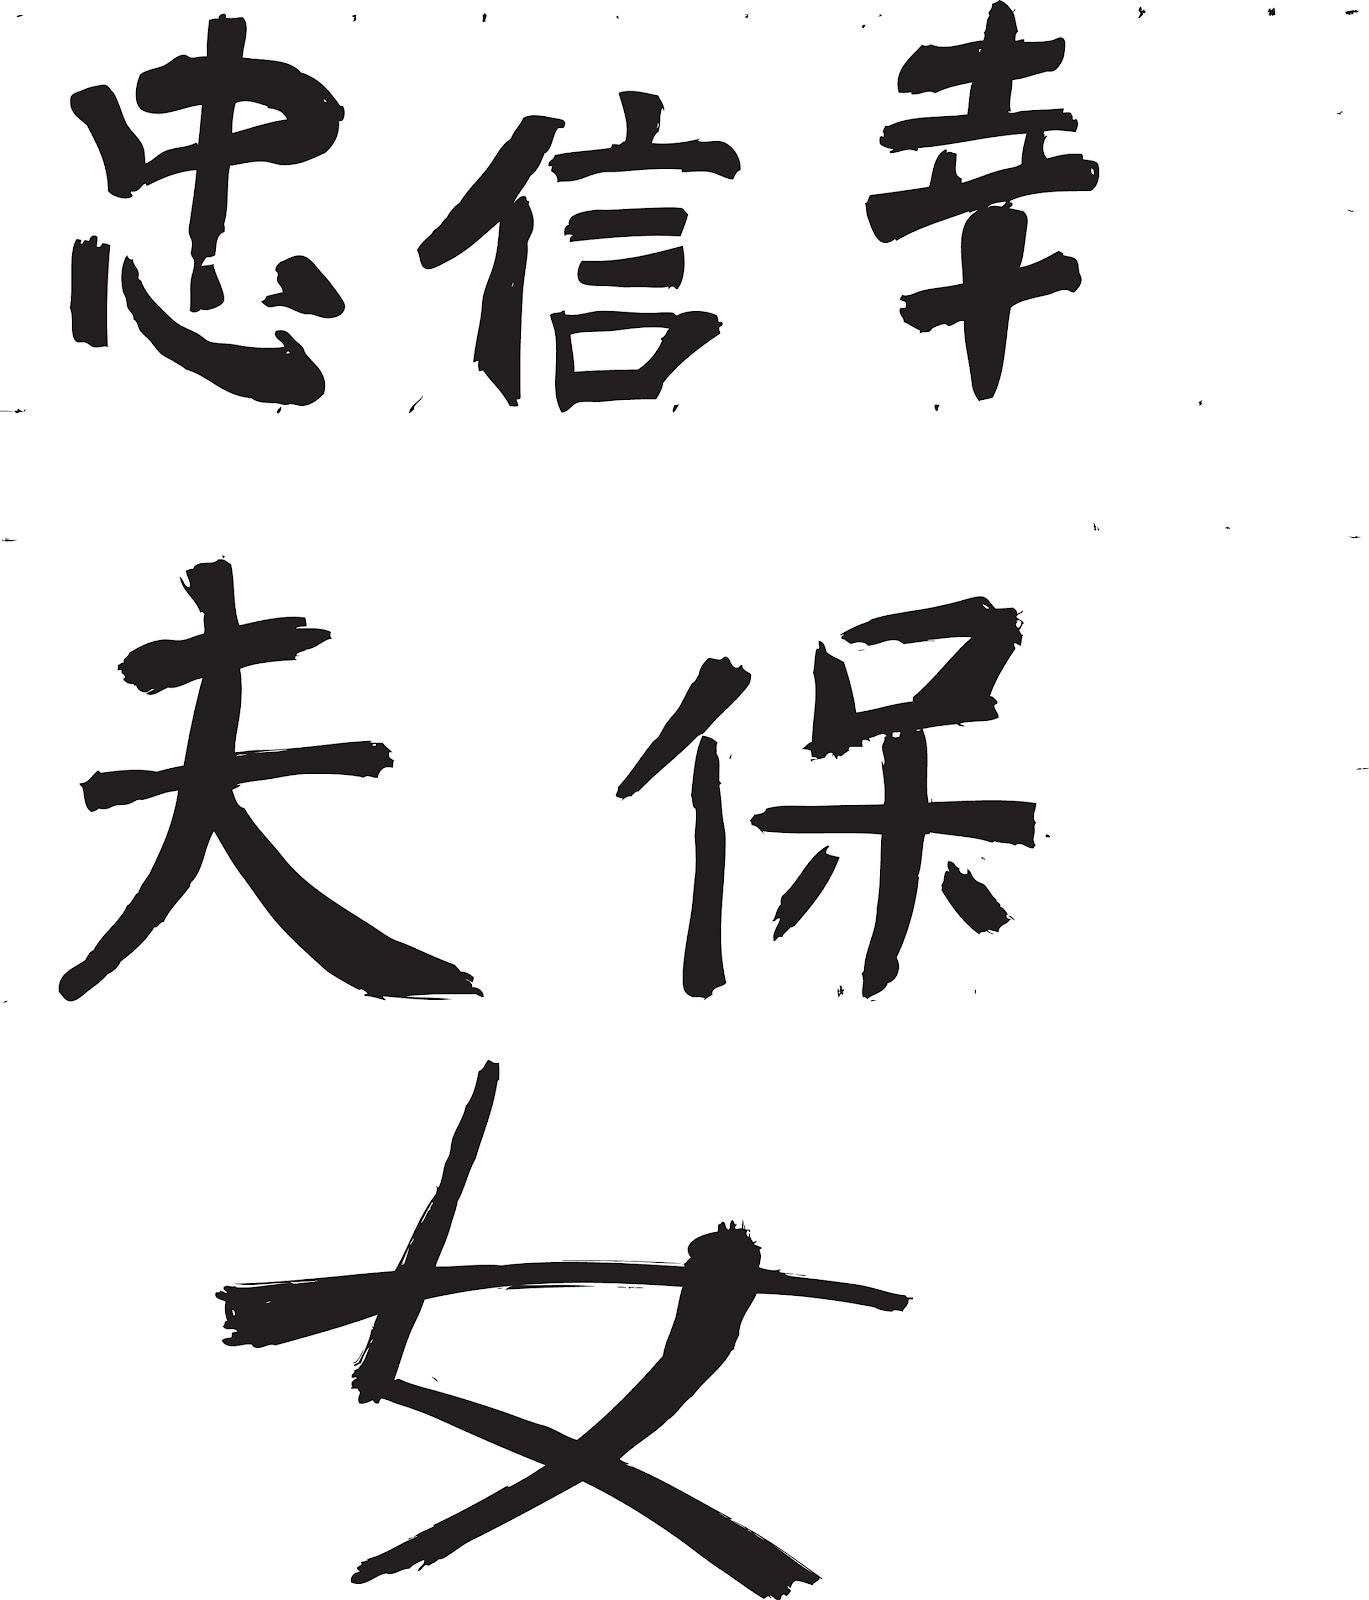 tipografia On letras asiaticas